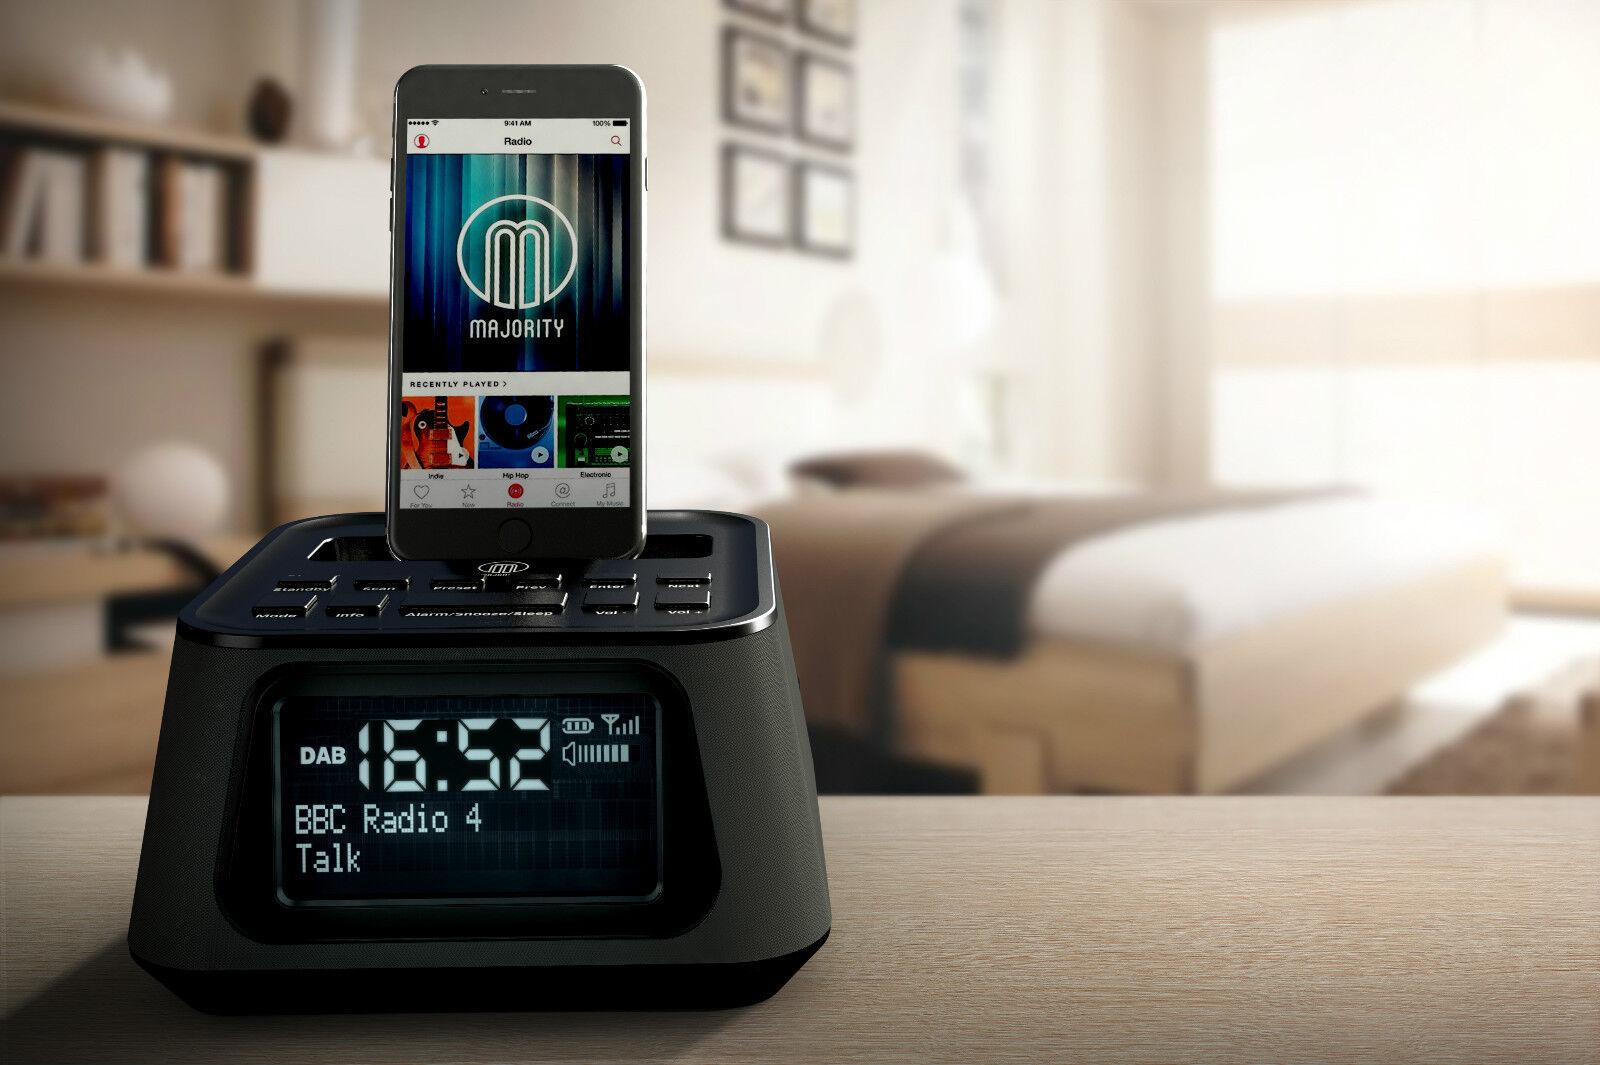 madingley rise dab radio docking station speaker dock alarm iphone 5 5s 5c 6. Black Bedroom Furniture Sets. Home Design Ideas